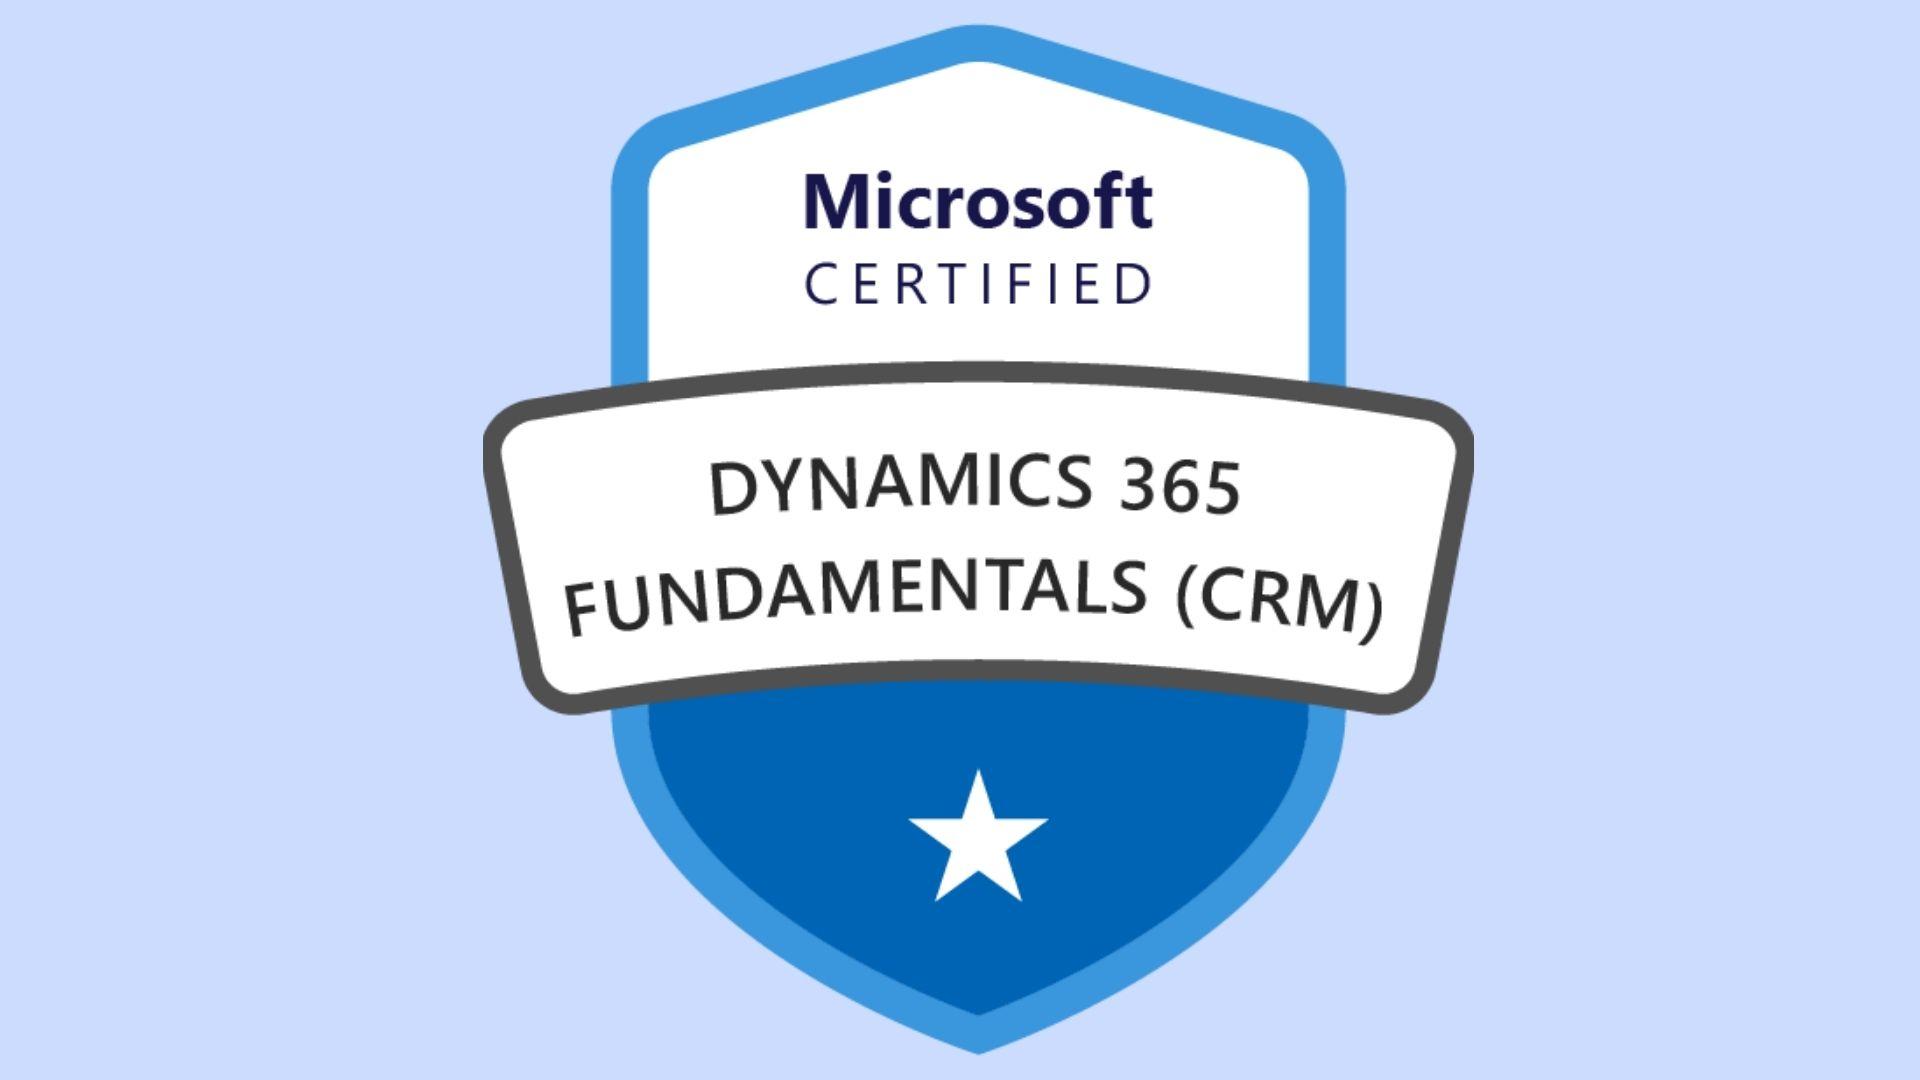 Microsoft Dynamics 365 Fundamentals CRM